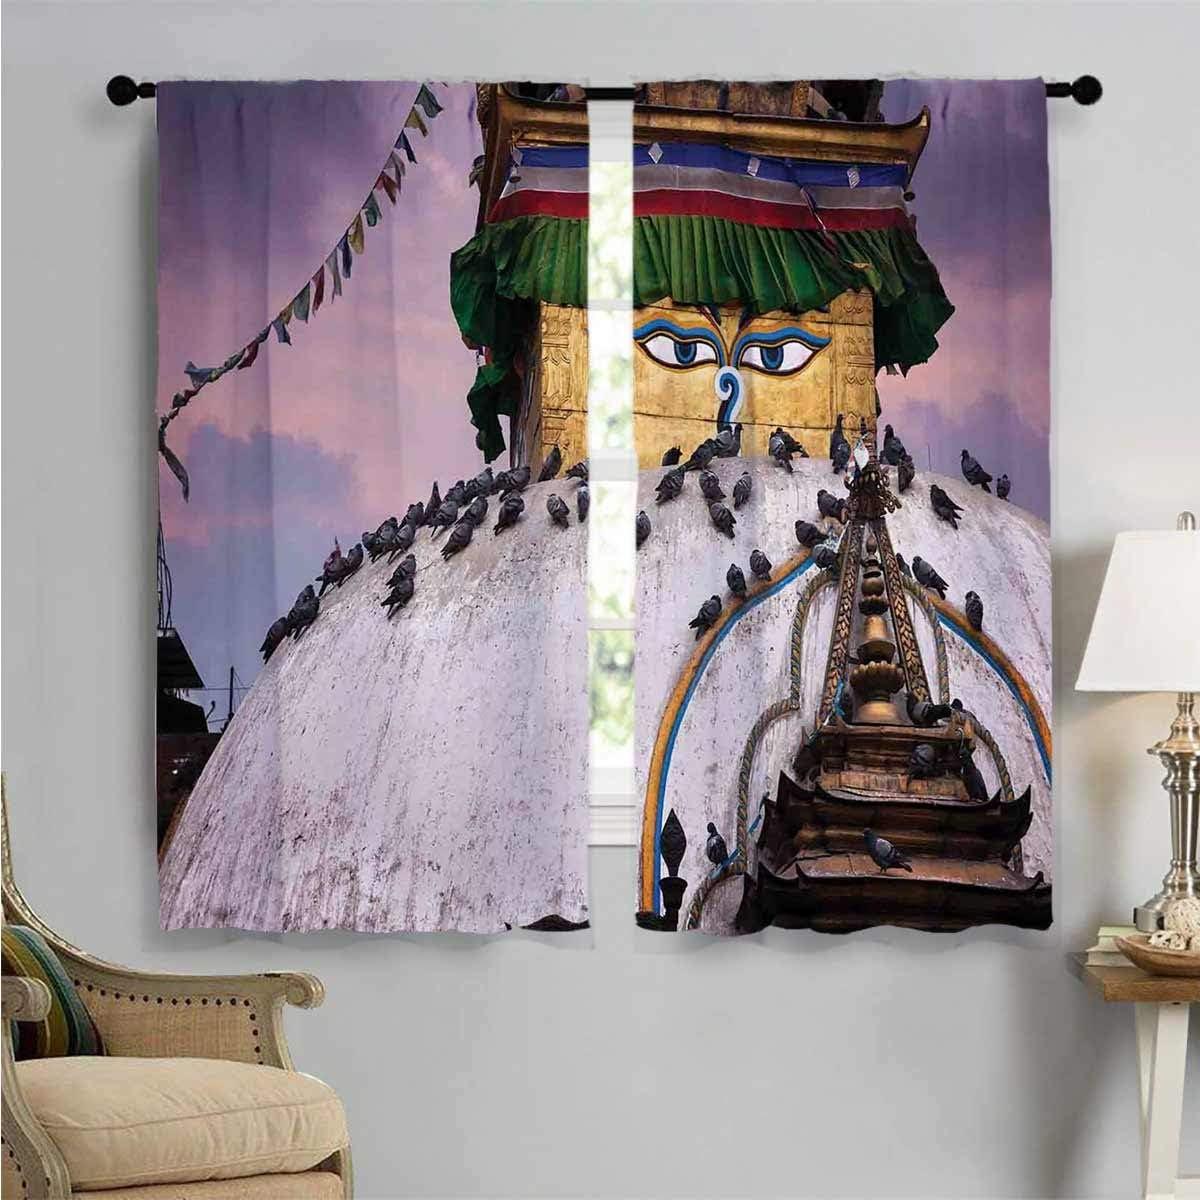 Blackout Max 63% OFF Window Curtain Kathesimbhu Stupa Thamel Decor Max 74% OFF